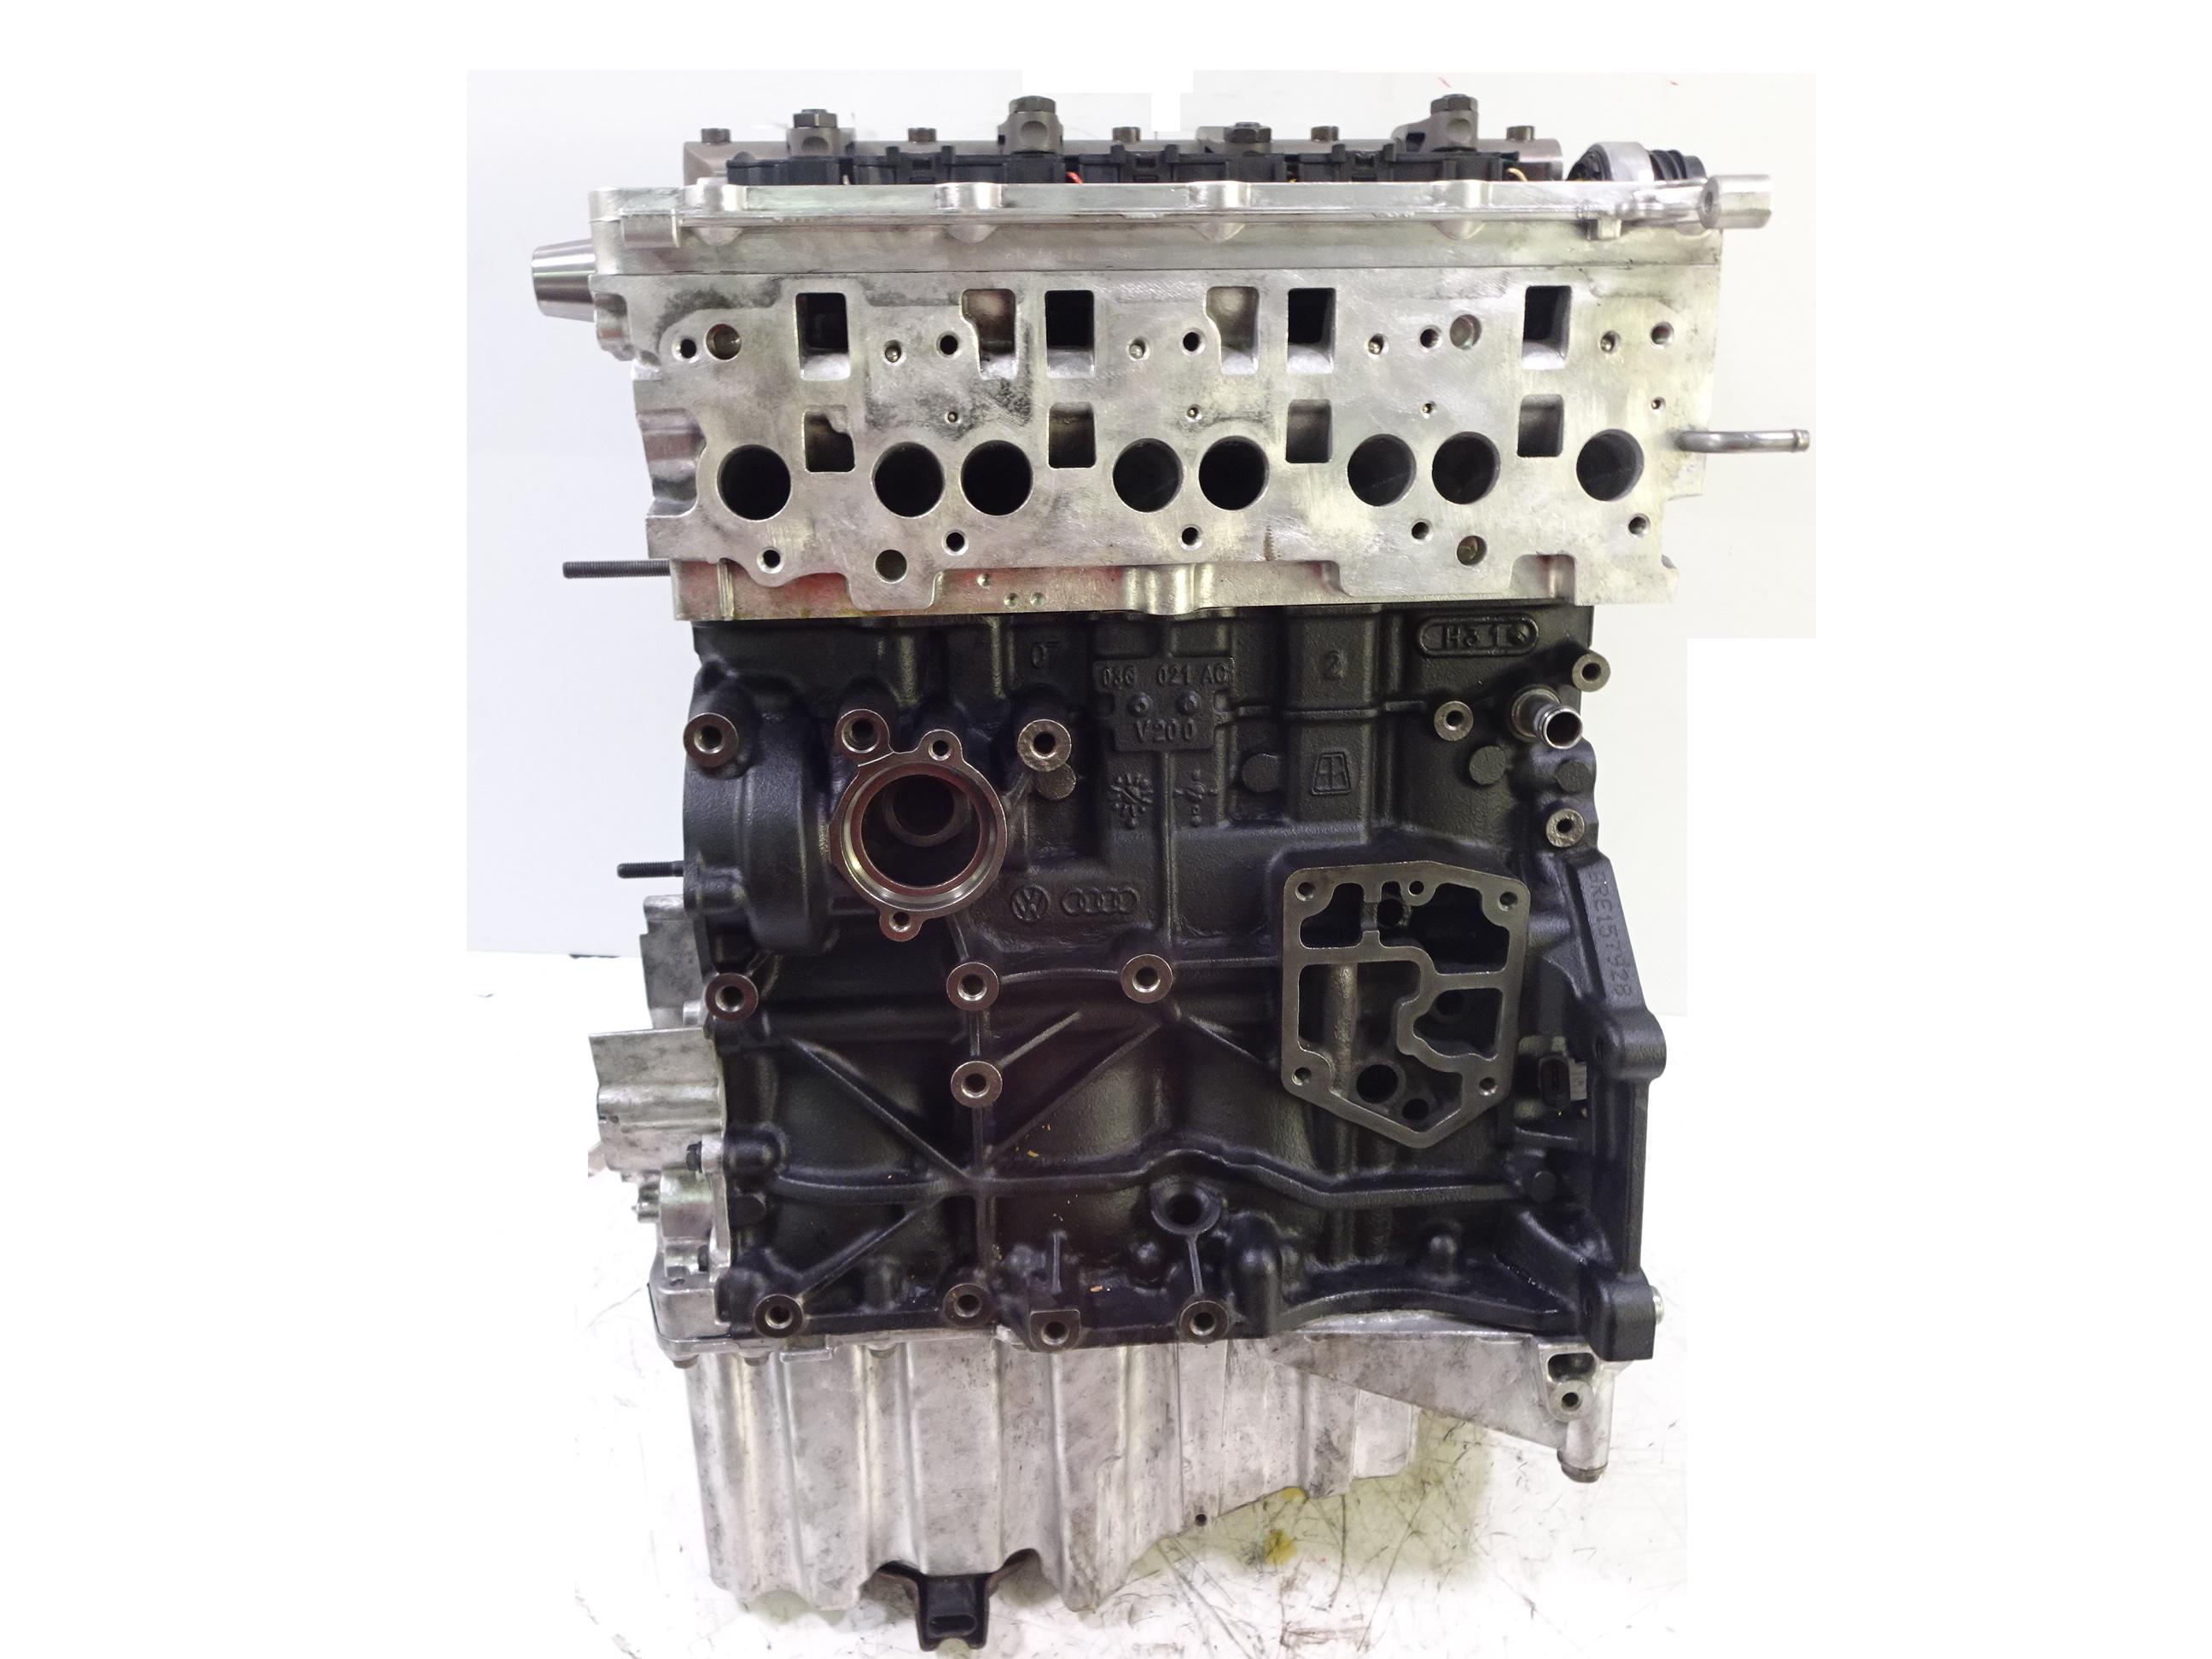 Motor 2006 Audi 2,0 TDI Diesel BRE Kopf geplant Dichtung NEU 140 PS